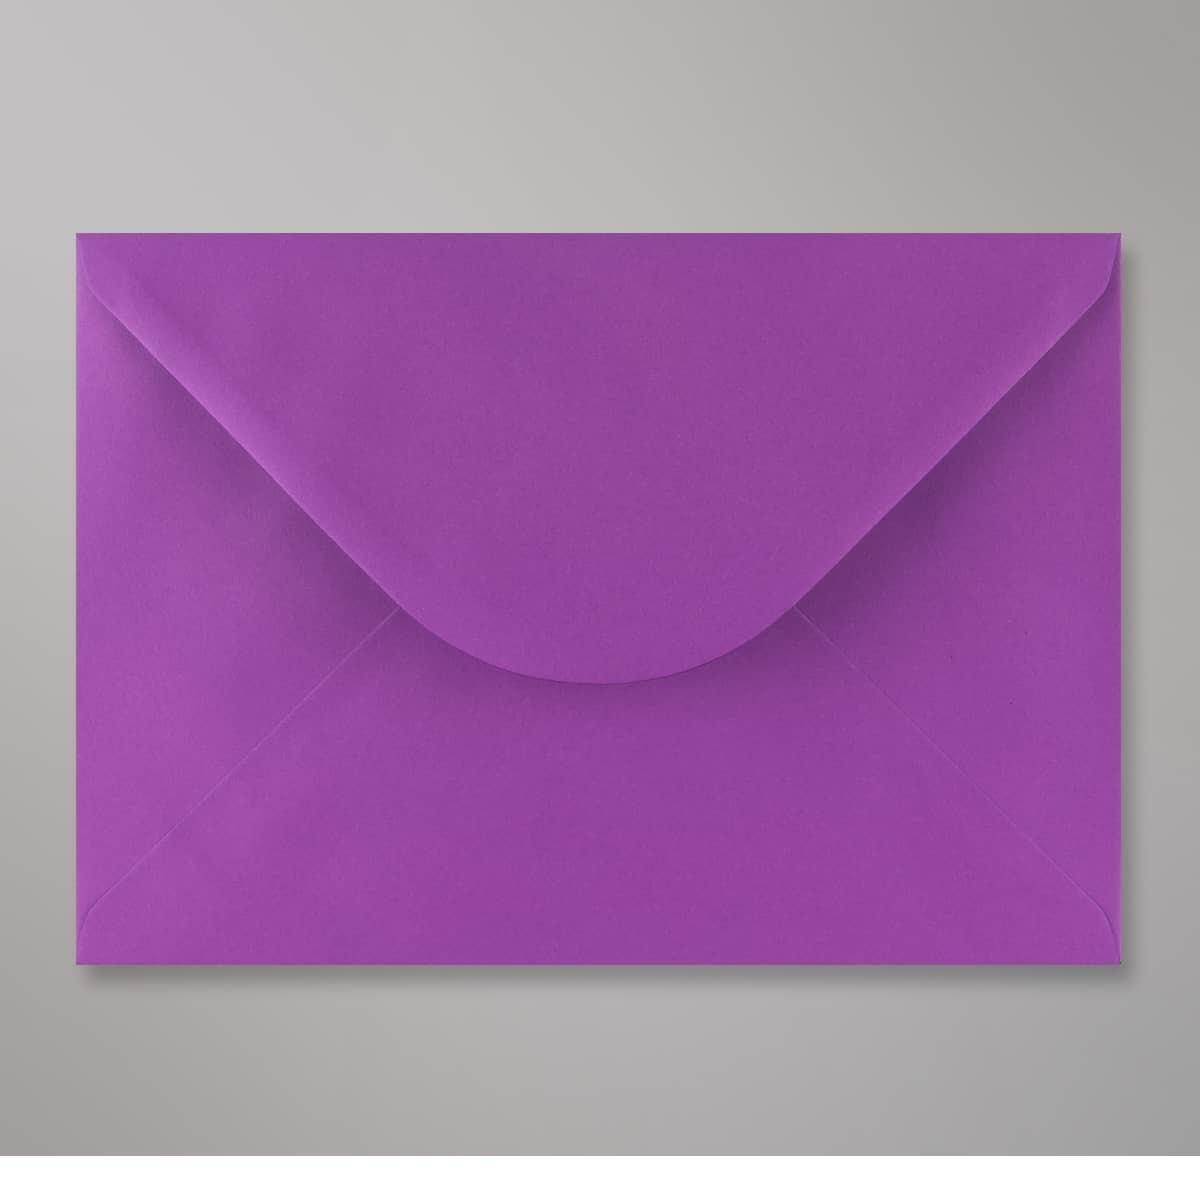 Enveloppe violette 162x229 mm (C5)